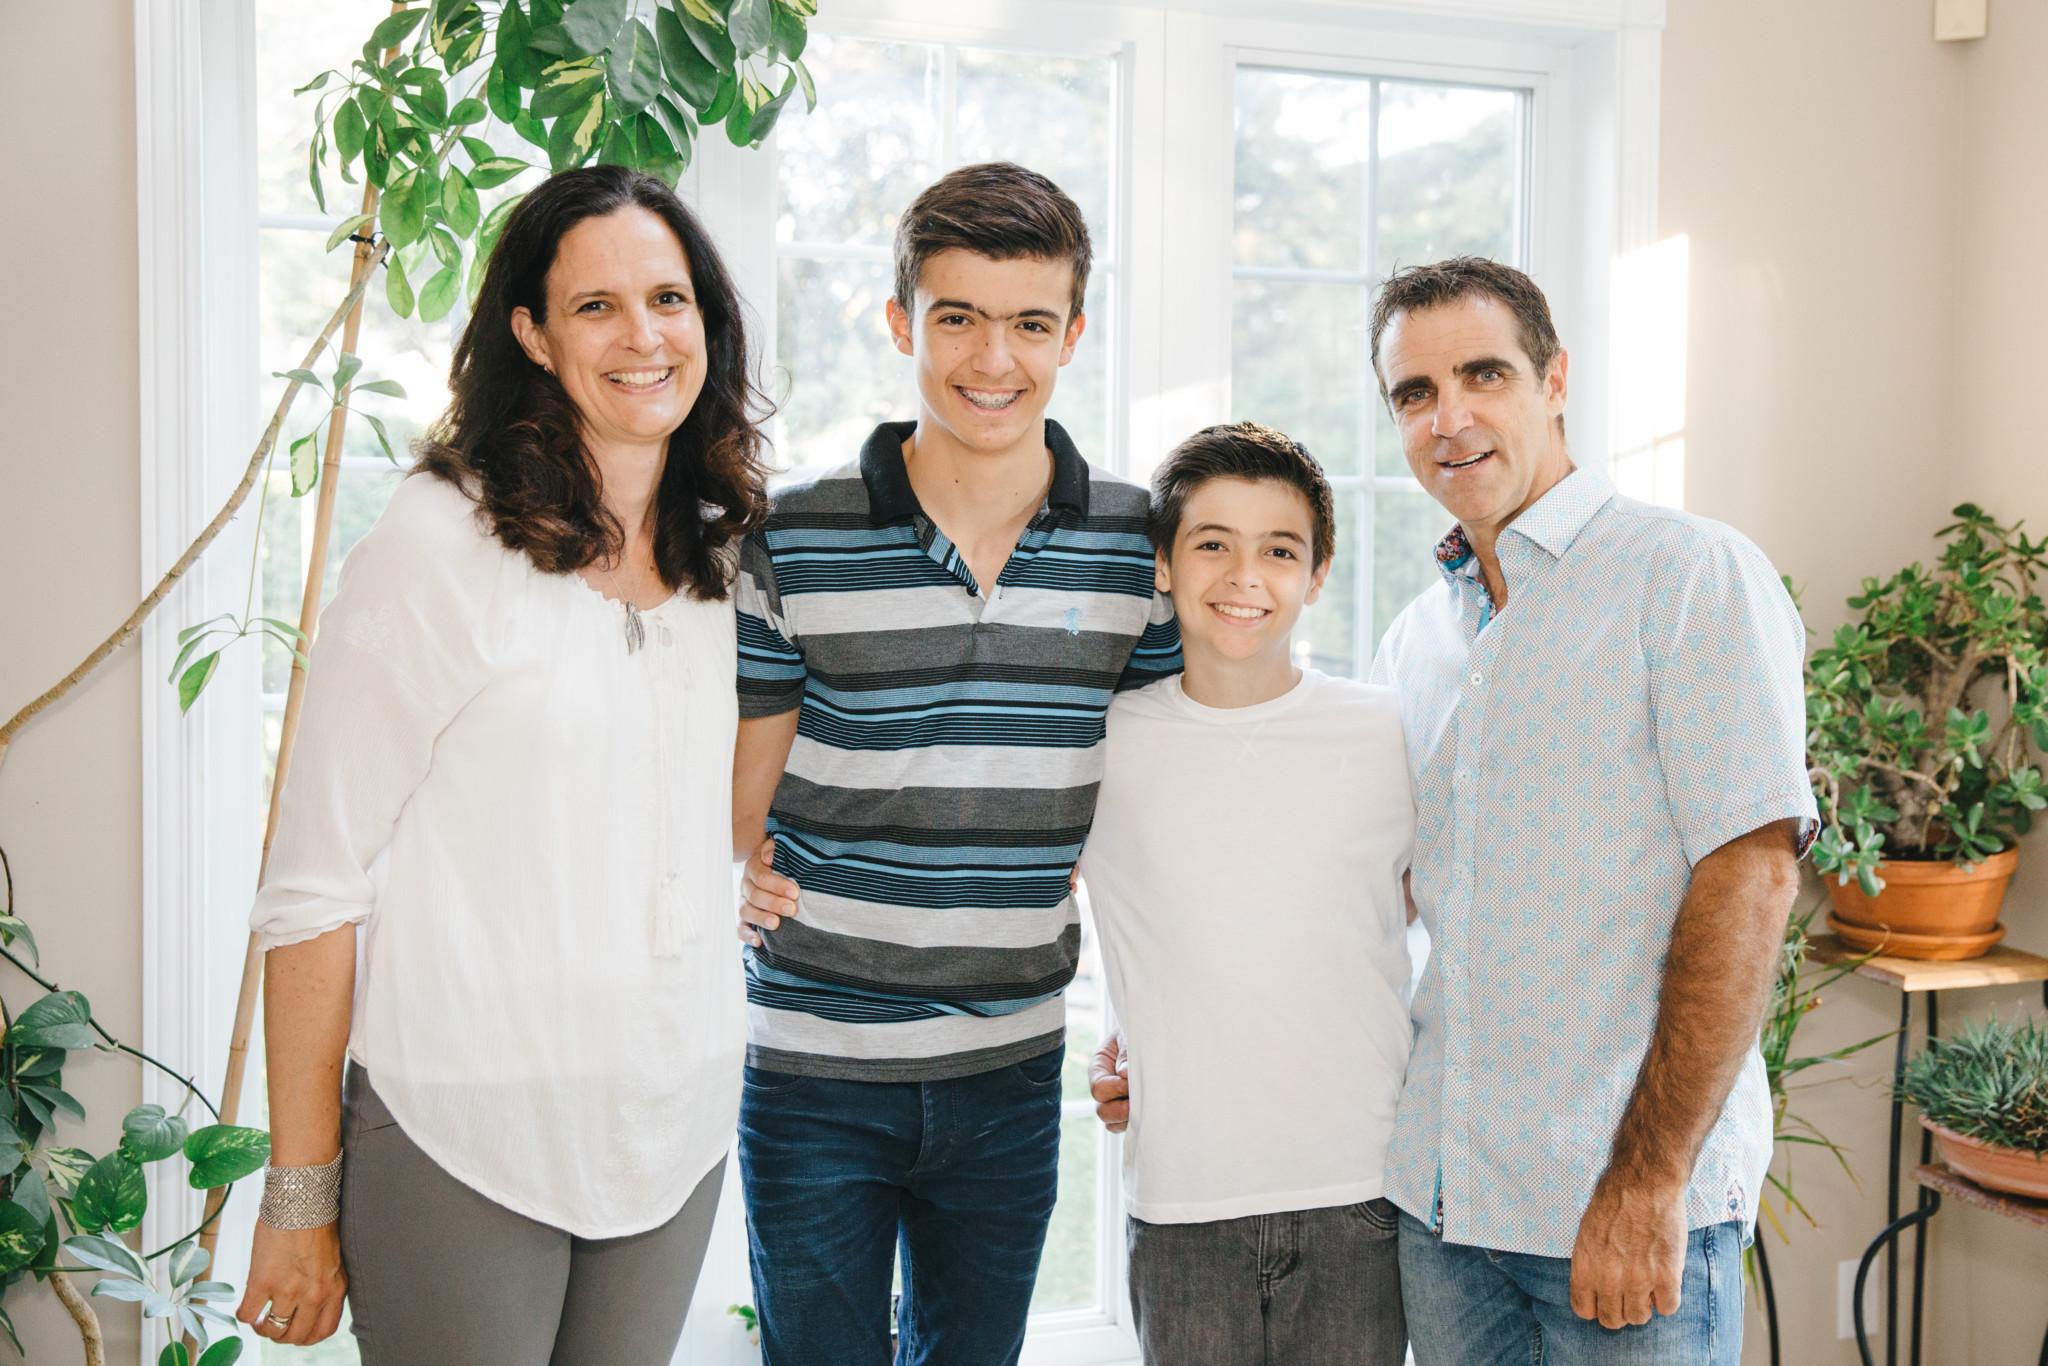 20170925 Famille Tessier Ggiguere 0007